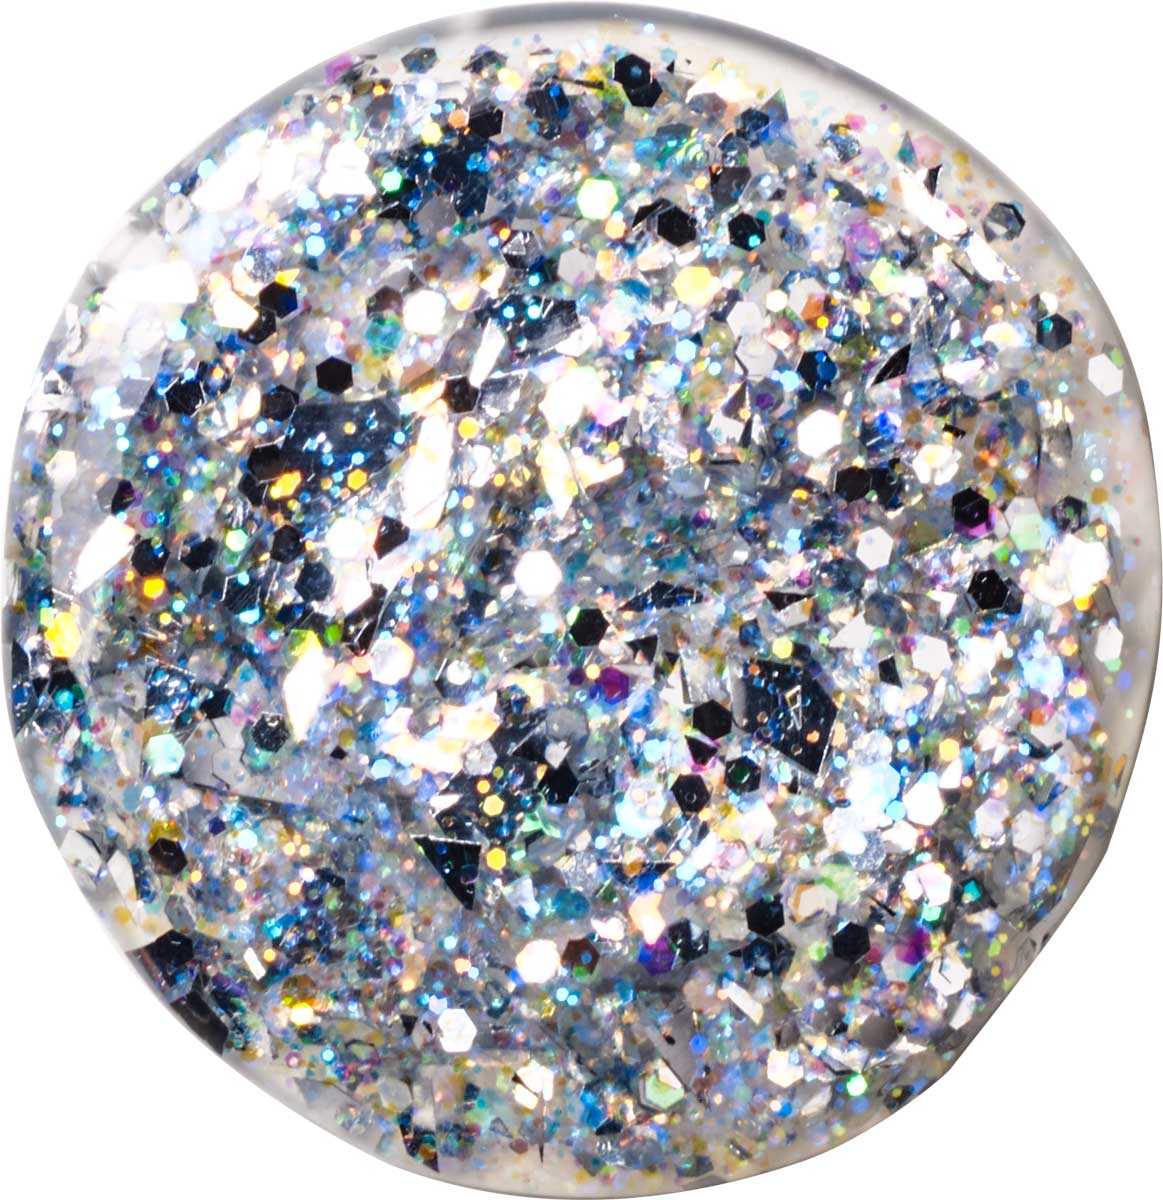 FolkArt ® Glitterific™ Acrylic Paint - Silver, 2 oz. - 5876